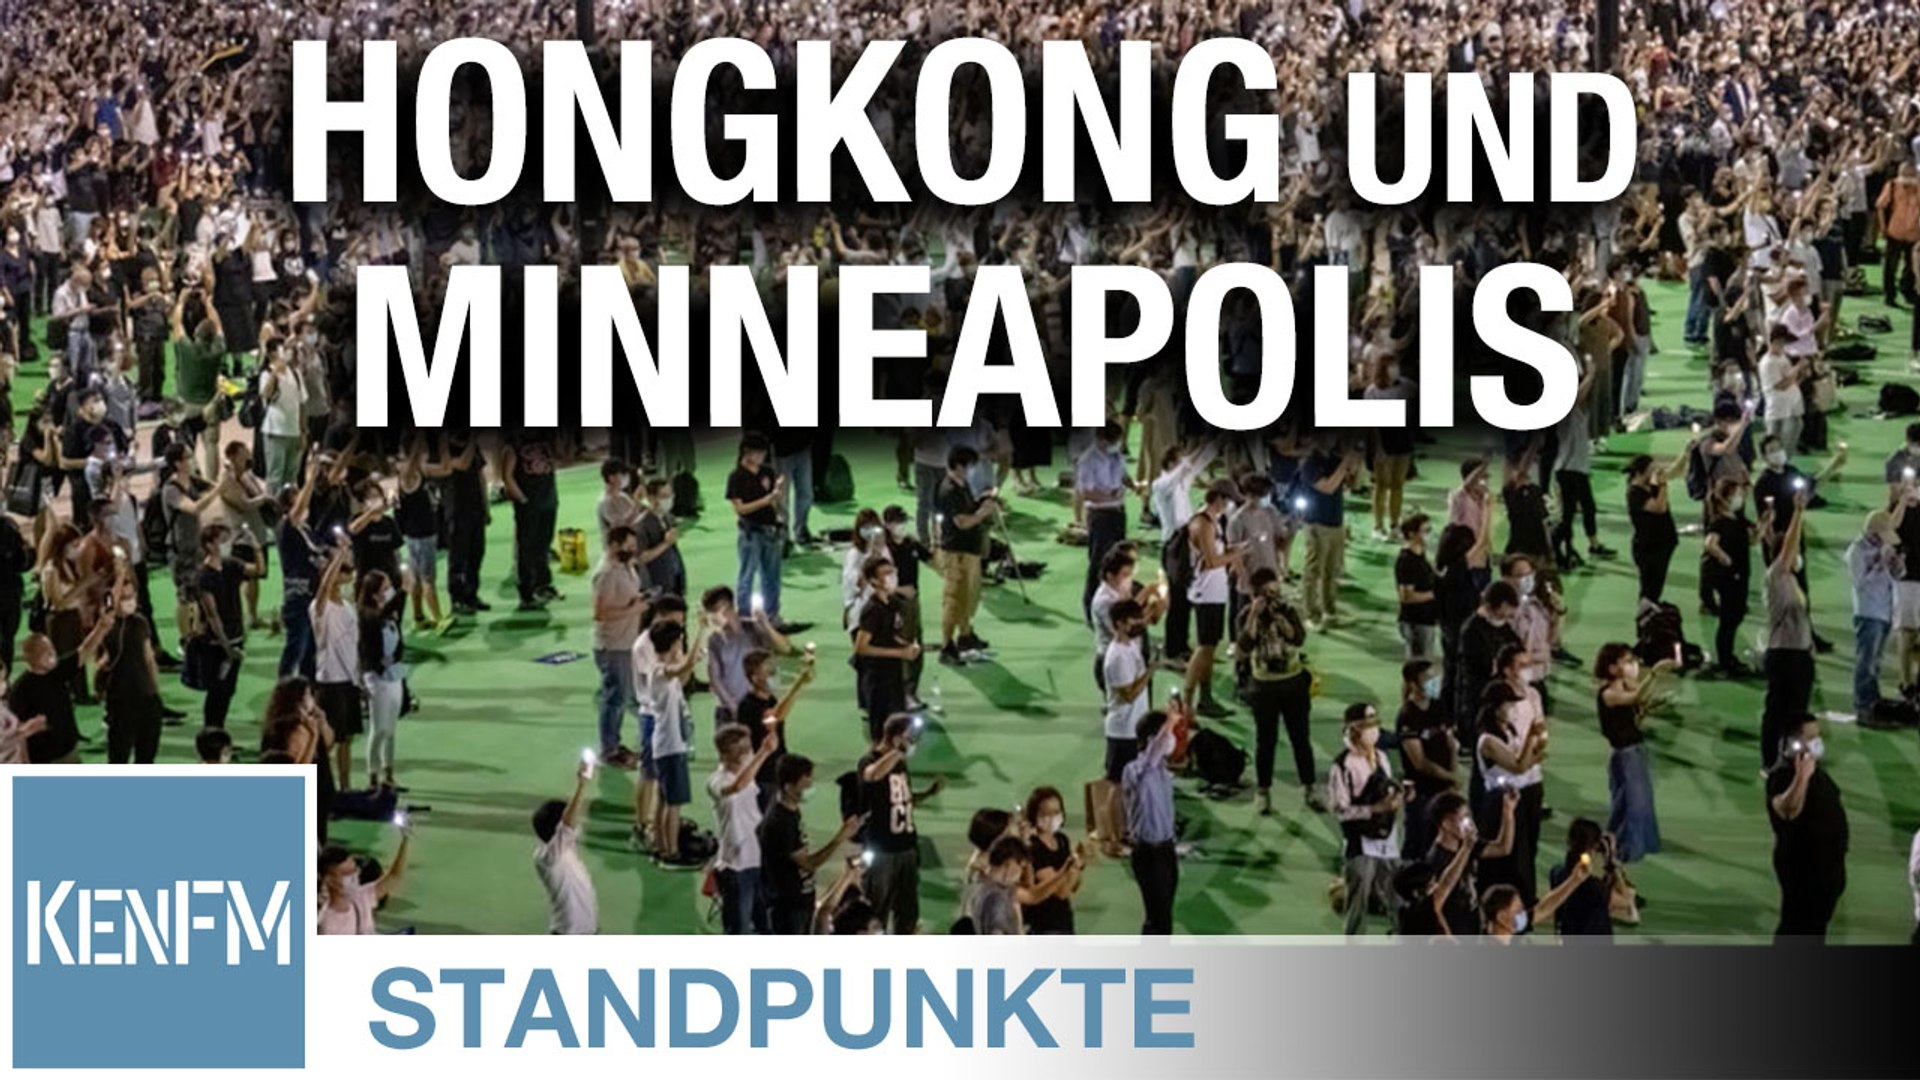 Hongkong und Minneapolis • STANDPUNKTE